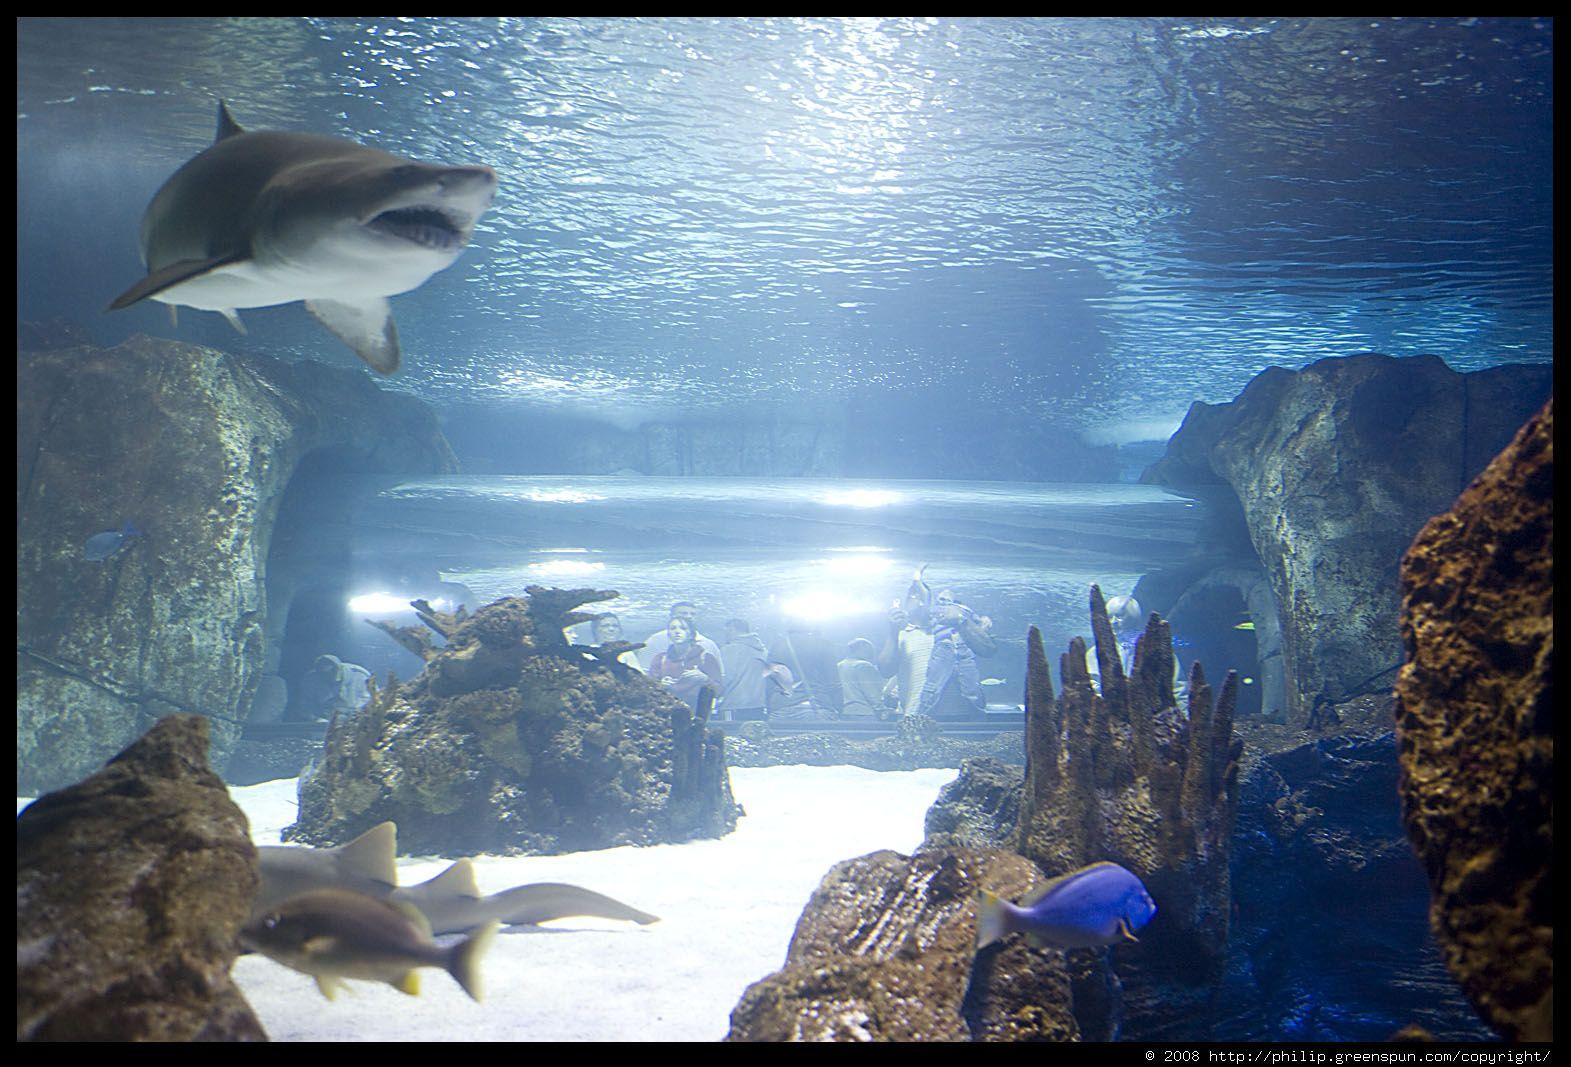 Newport Aquarium | Newport kentucky, My old kentucky home